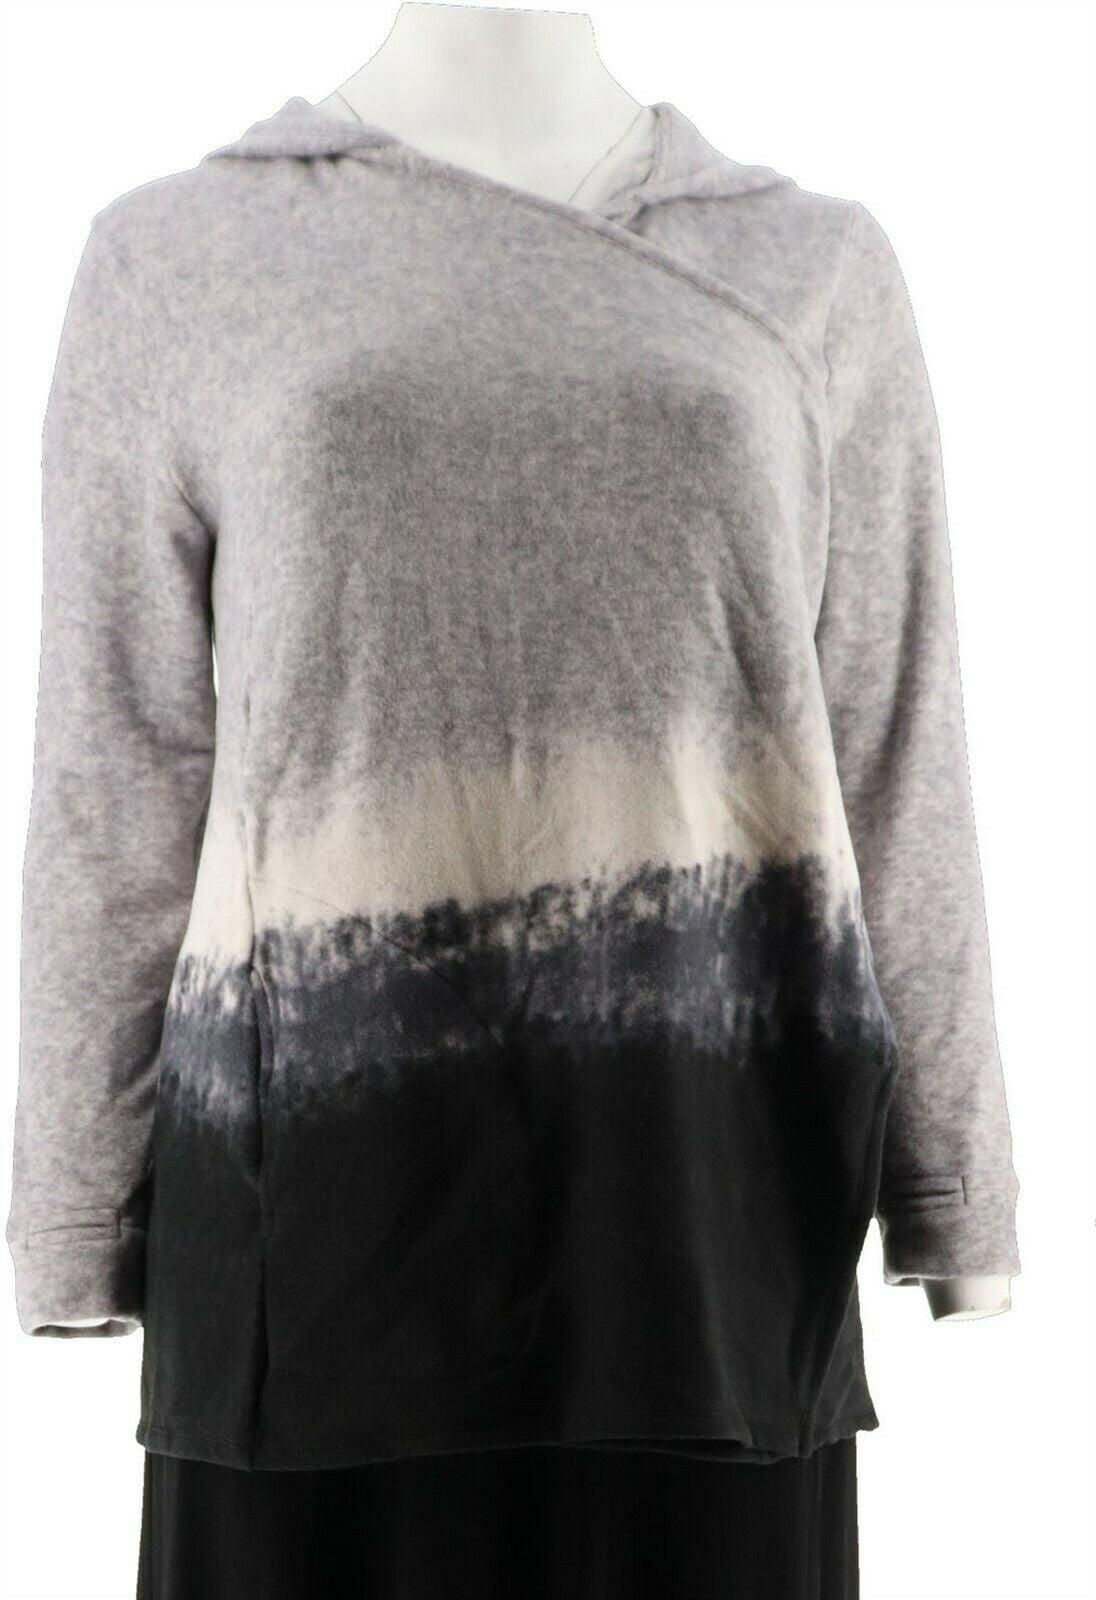 Cuddl Duds Fleecewear Stretch Long Wrap Black Color Size 1X